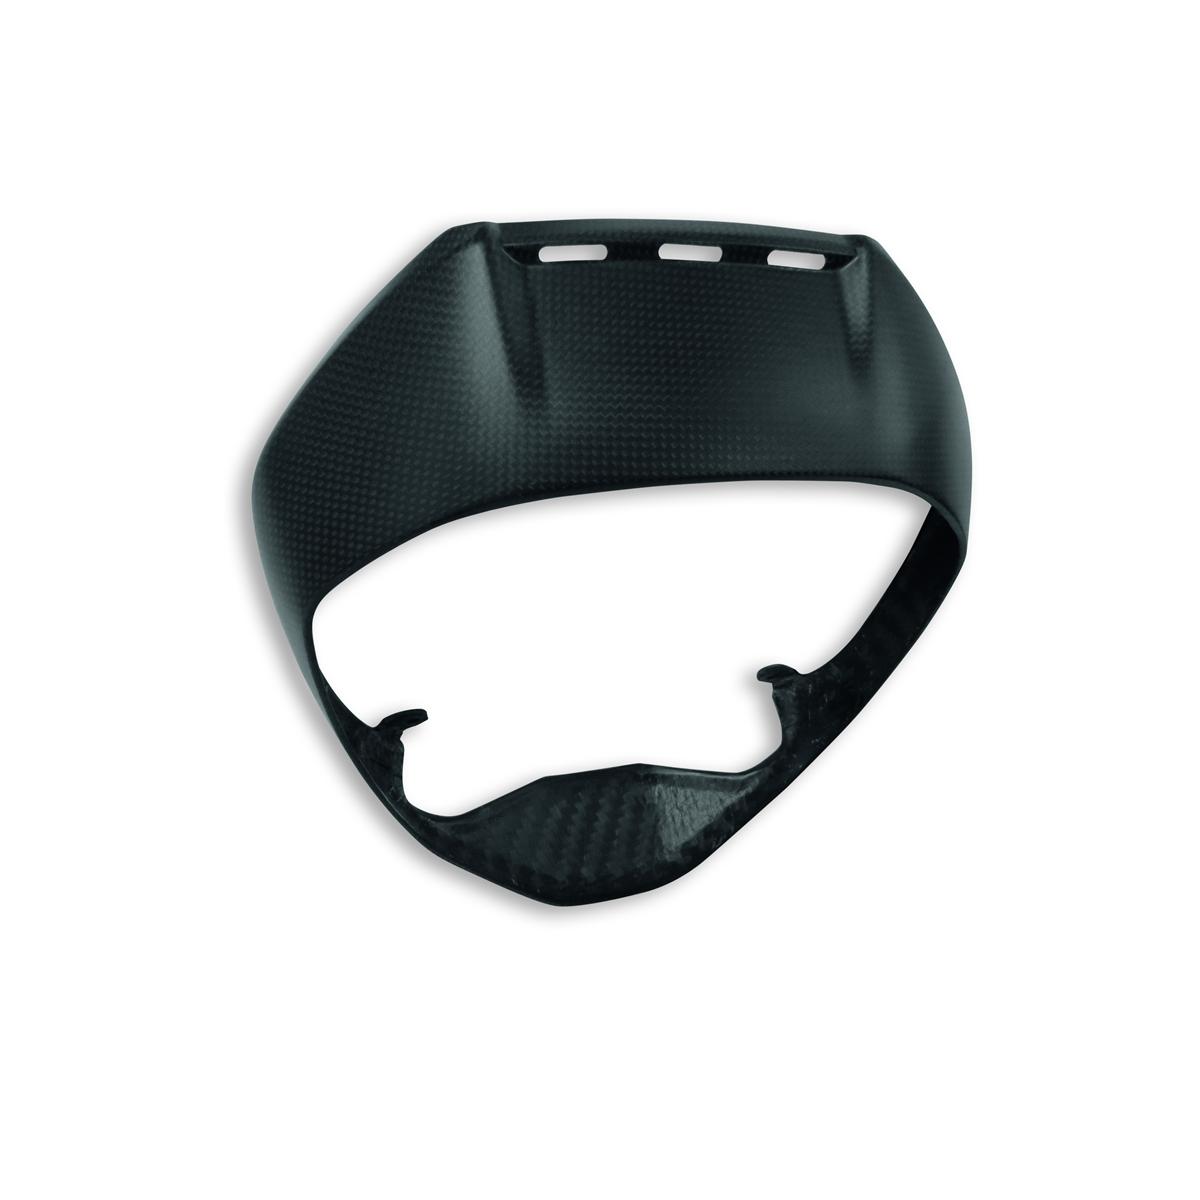 Diavel 1260 Carbon headlight frame